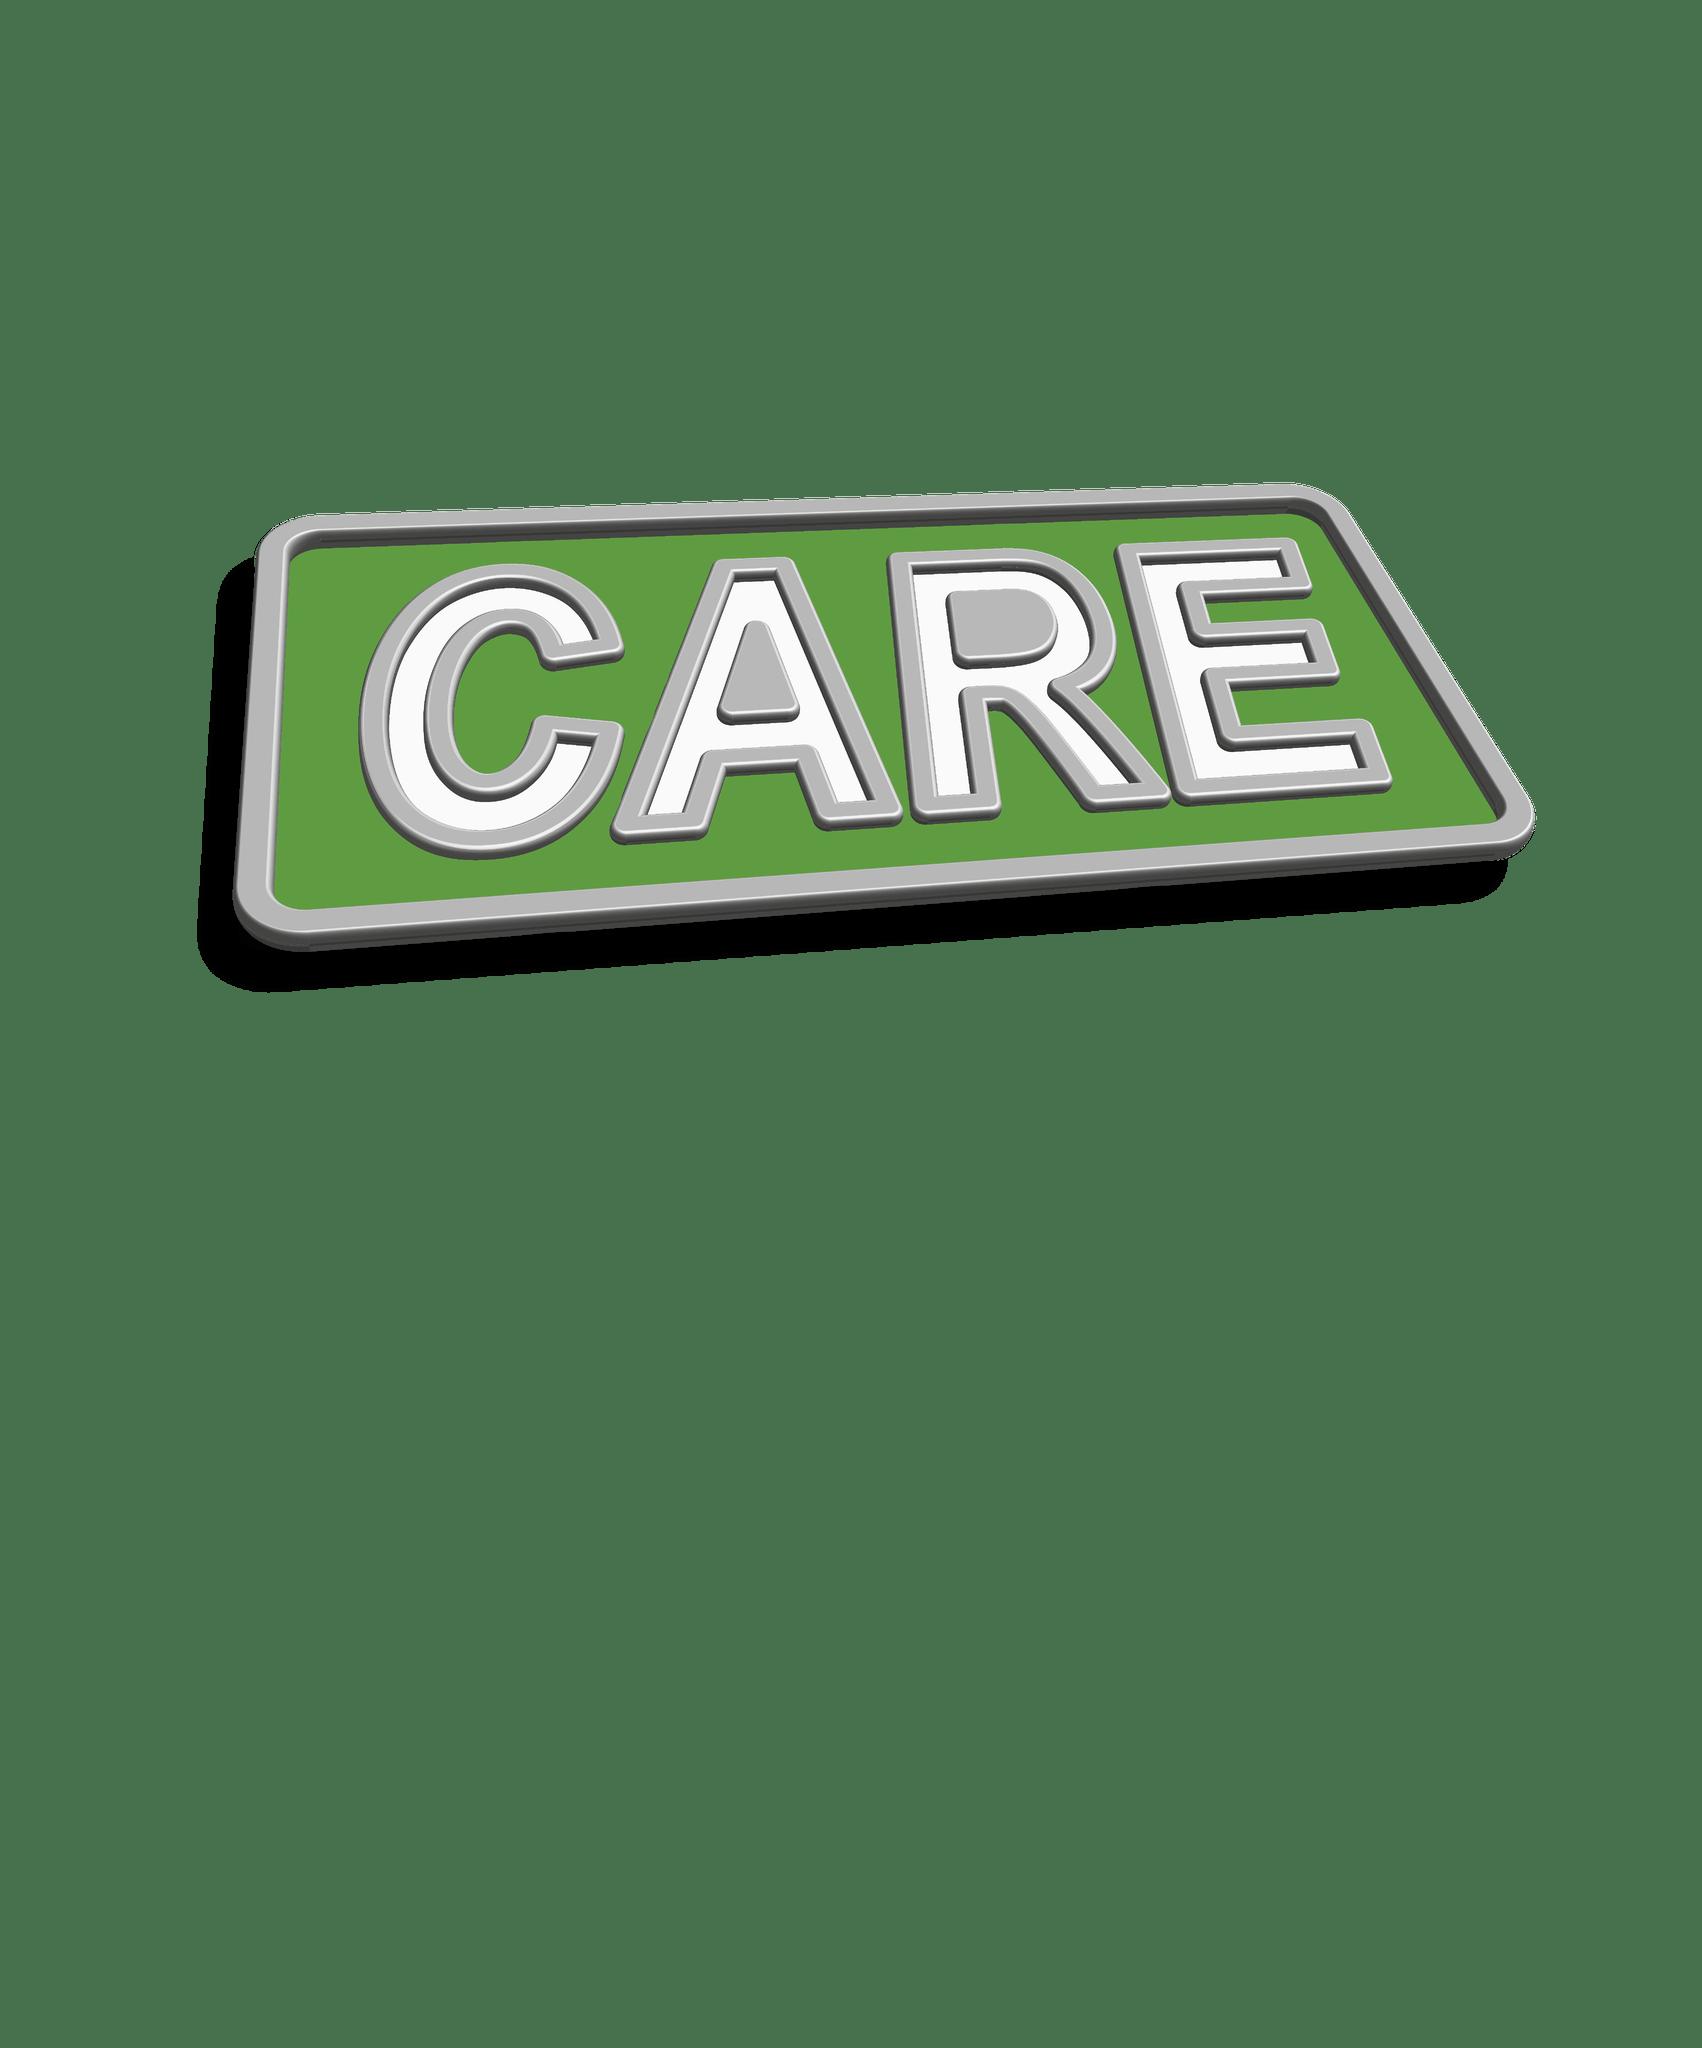 Care-badge-logo